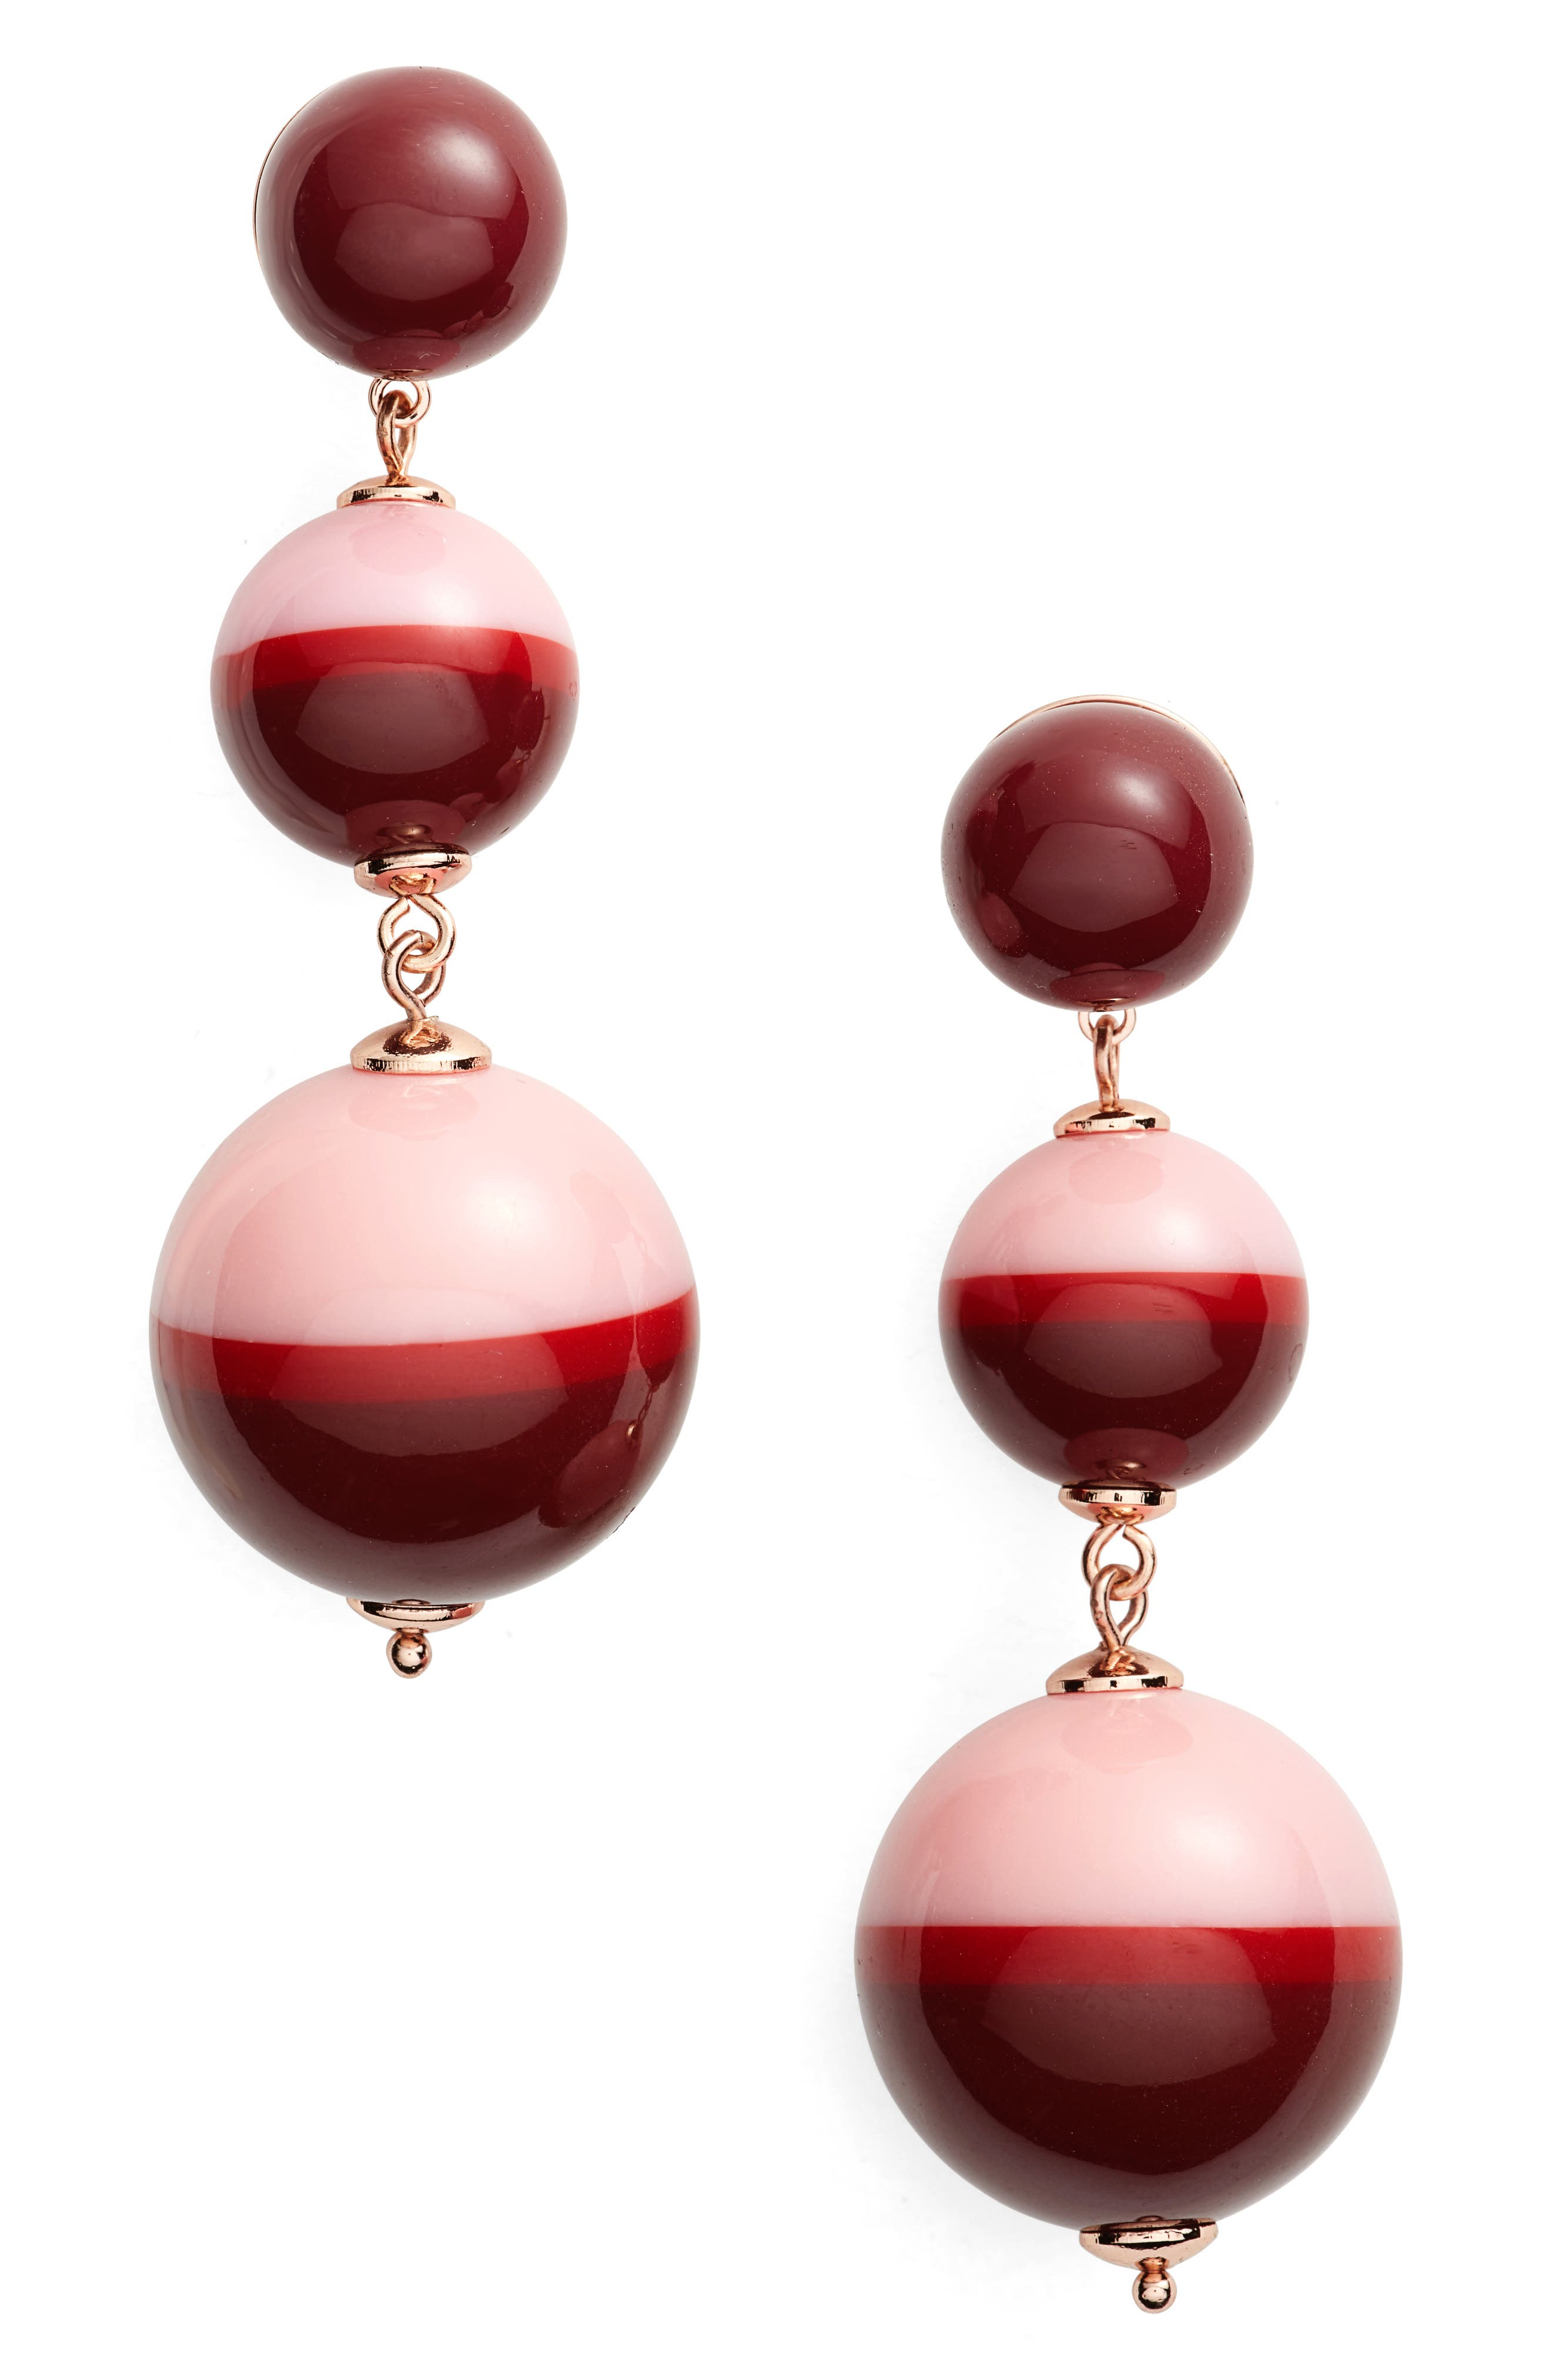 kate spade new york in a flash drop earrings